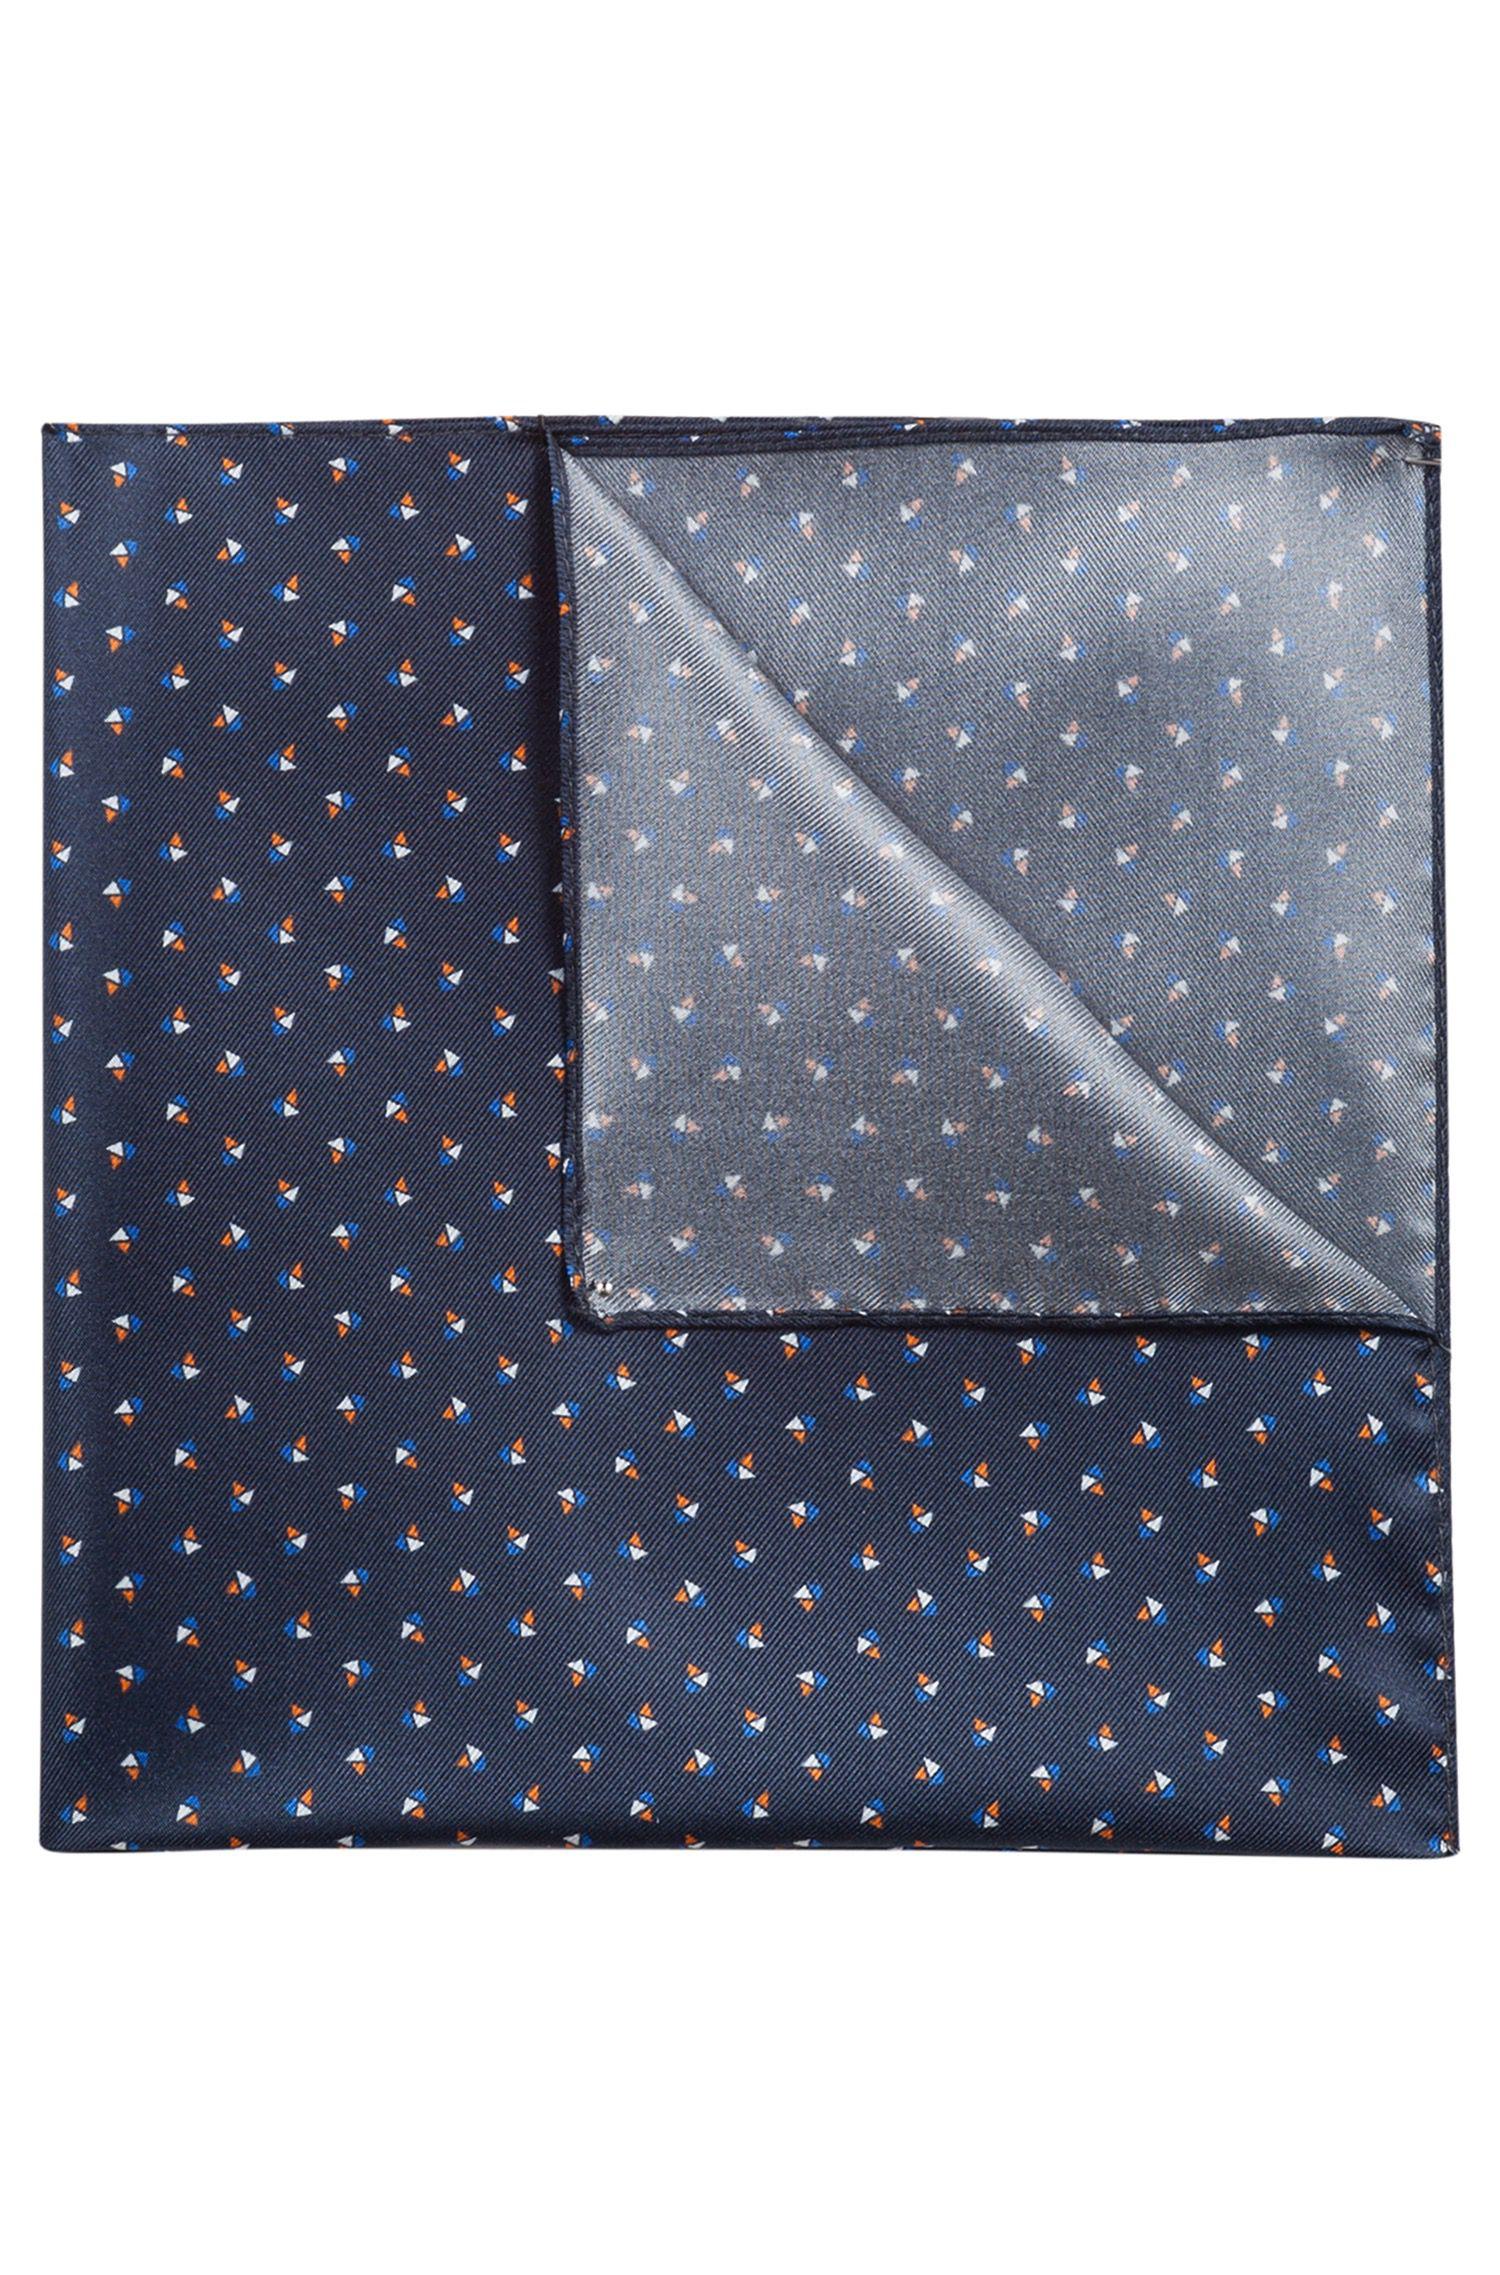 Pañuelo de bolsillo en sarga de seda estampada